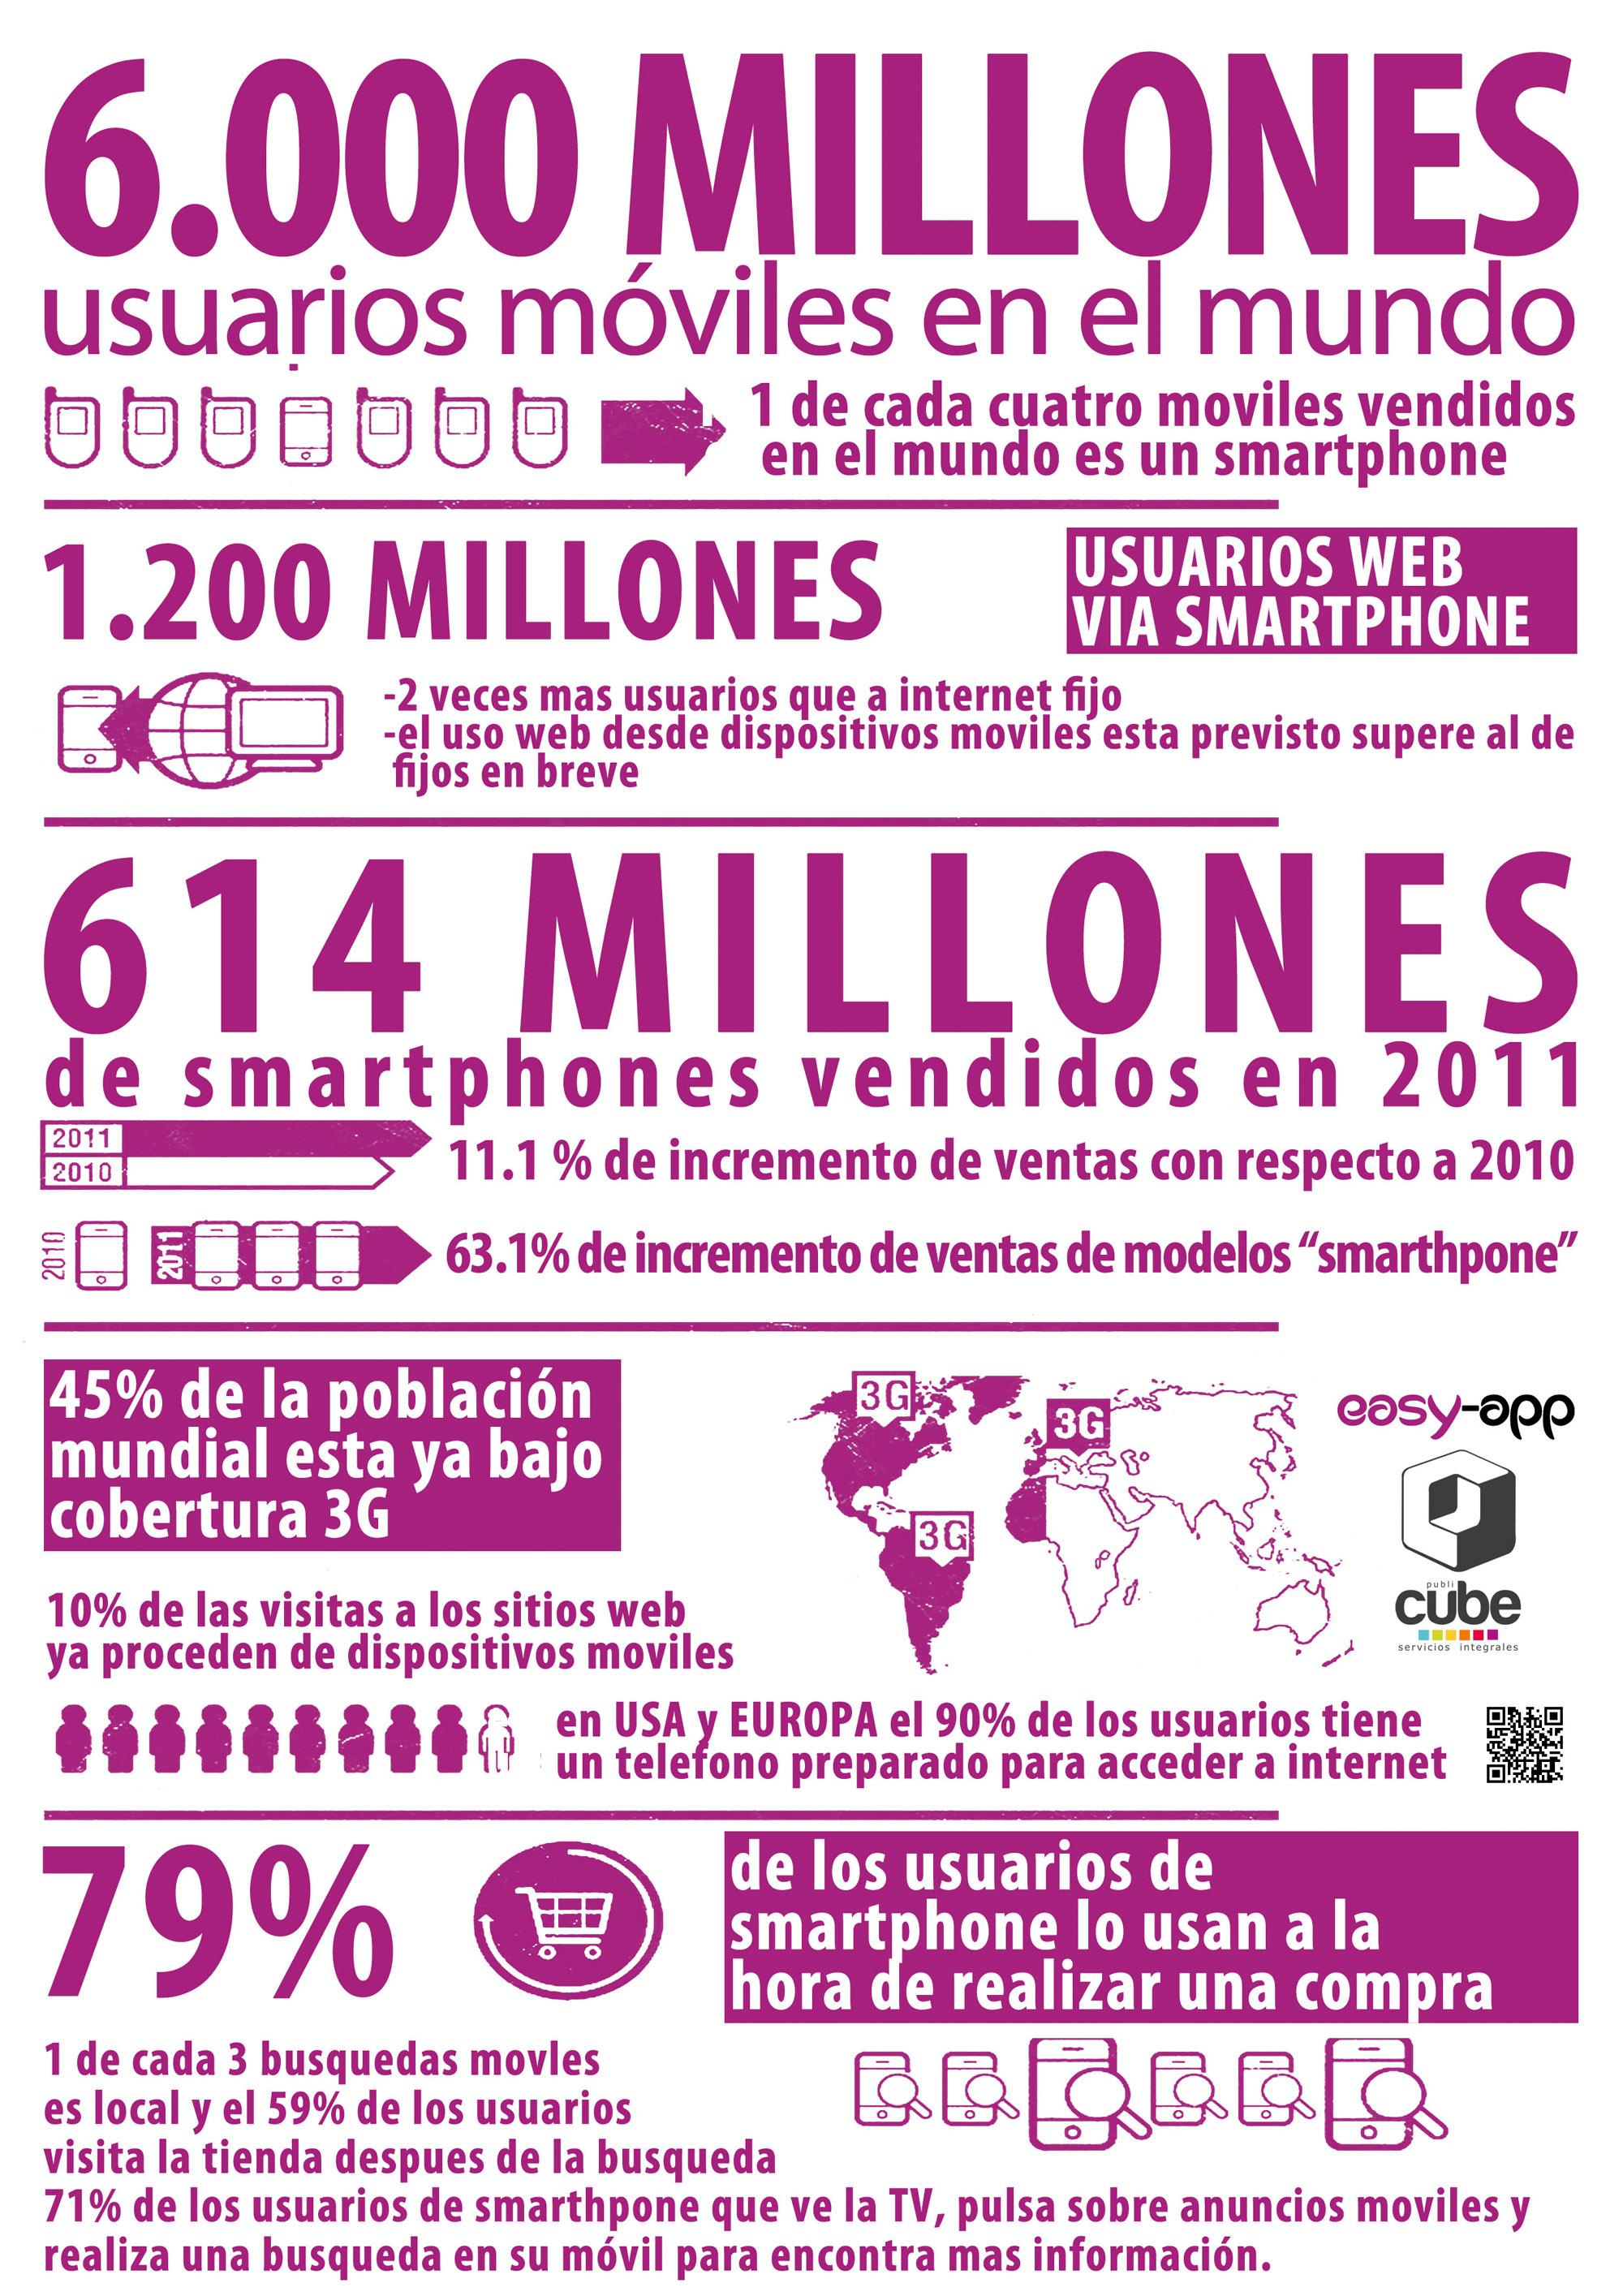 info aplicaciones moviles smartphone easyapp cube2012